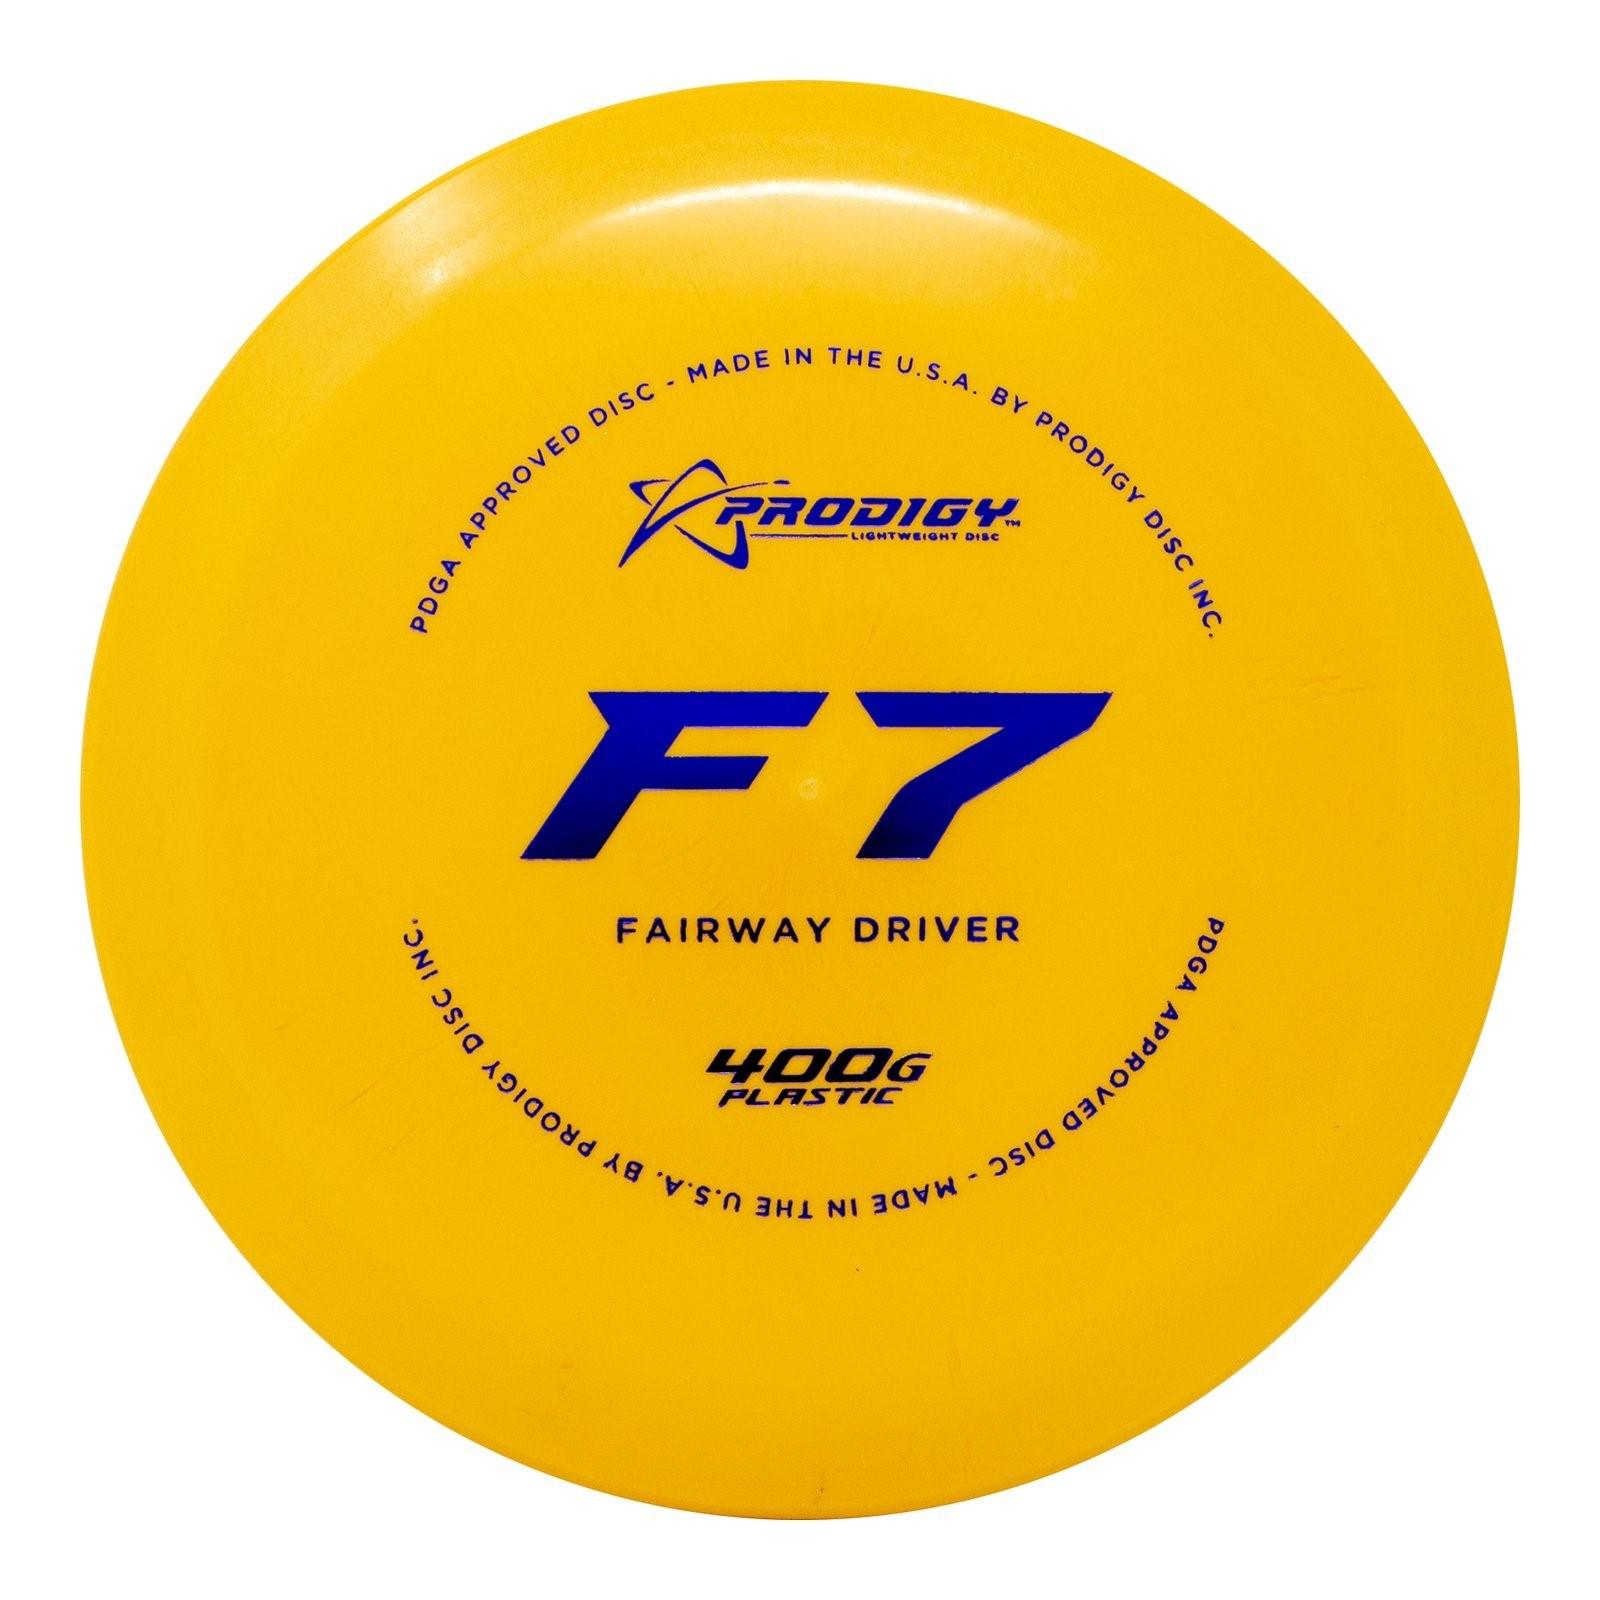 Prodigy F7 fairway driver